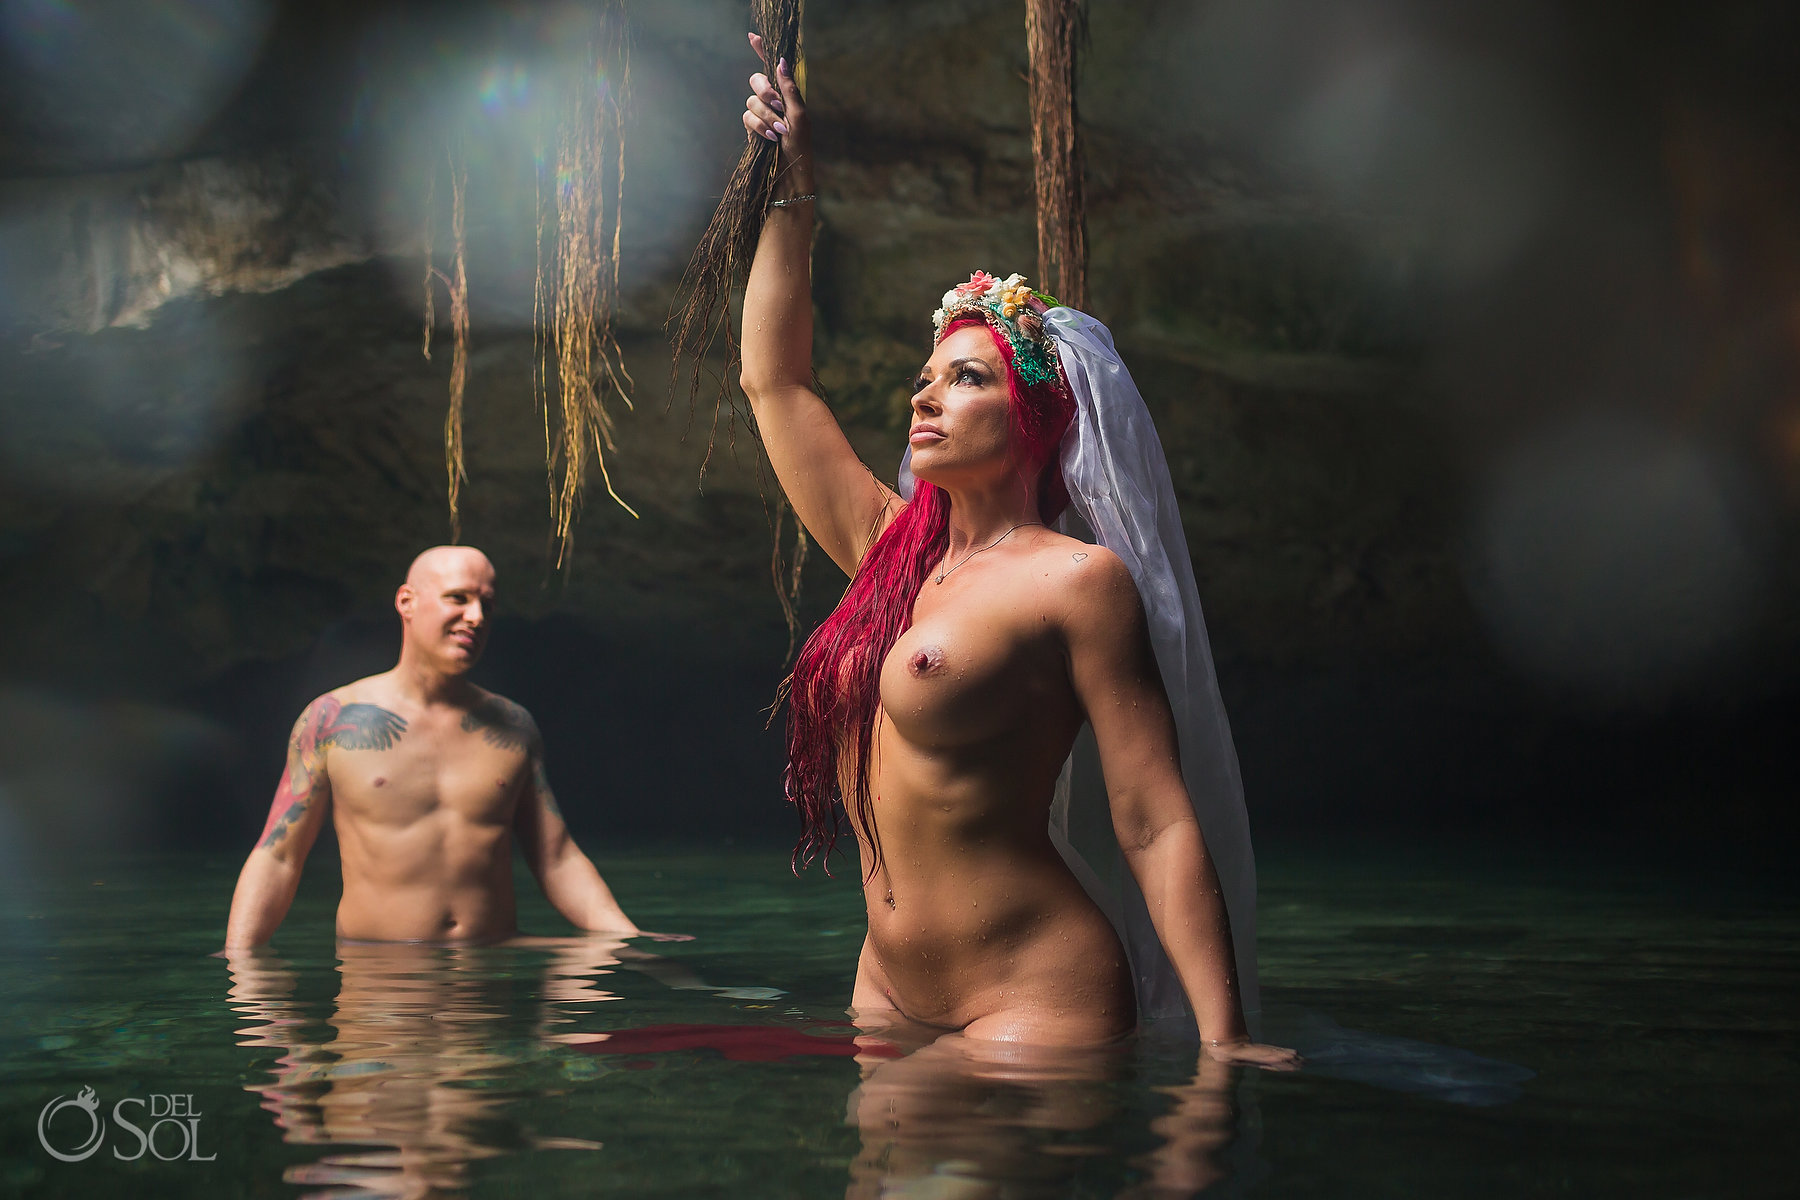 Adam And Eve Sex Pics adam + eve - sexy anniversary photo ideas - del sol photography